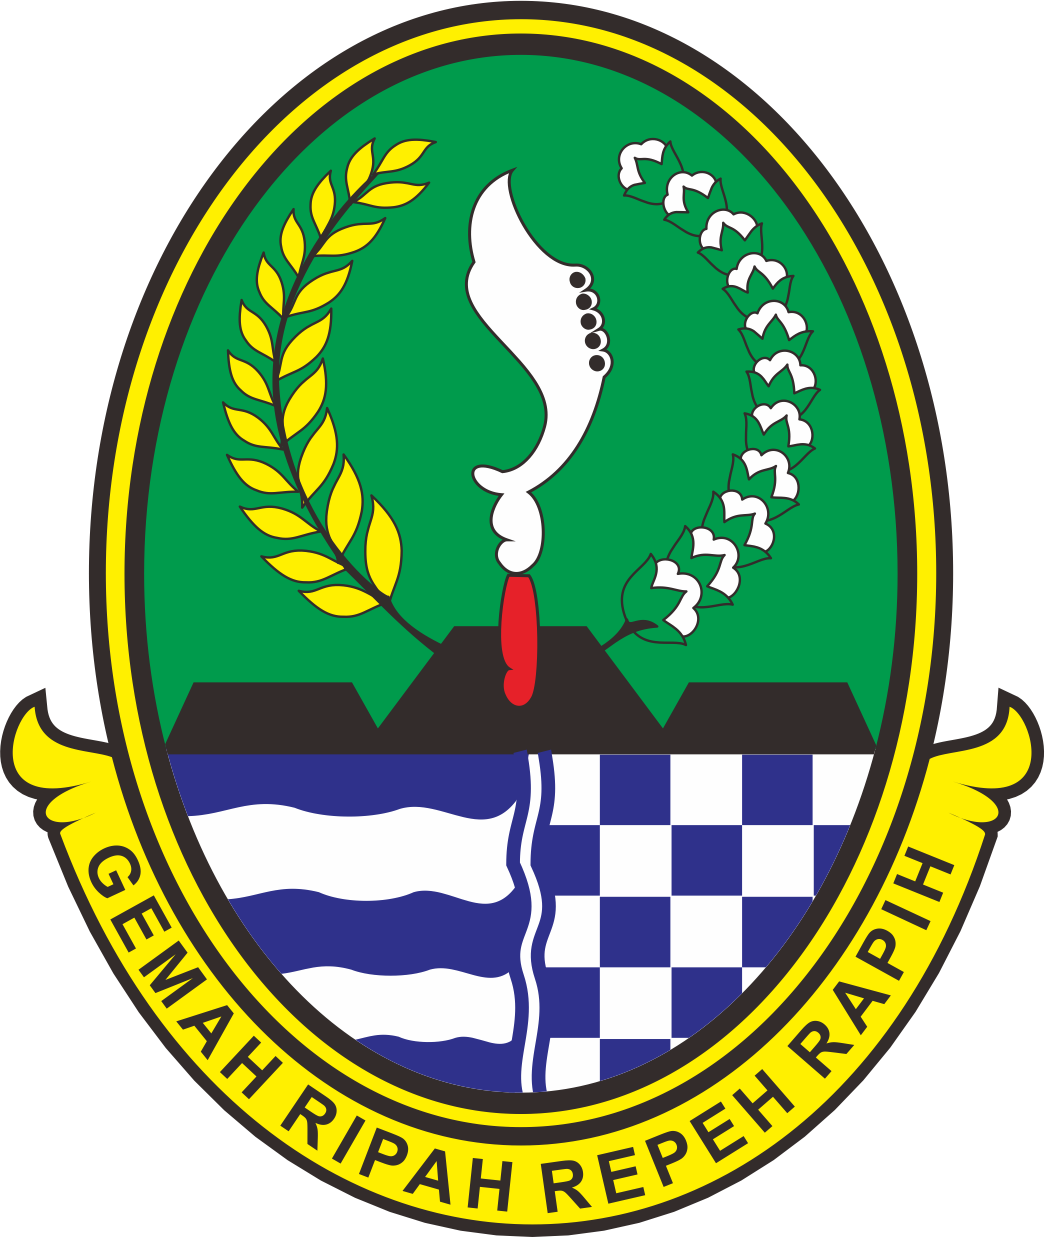 Pengumuman Hasil Kelulusan CPNS Provinsi Jawa Barat 2014